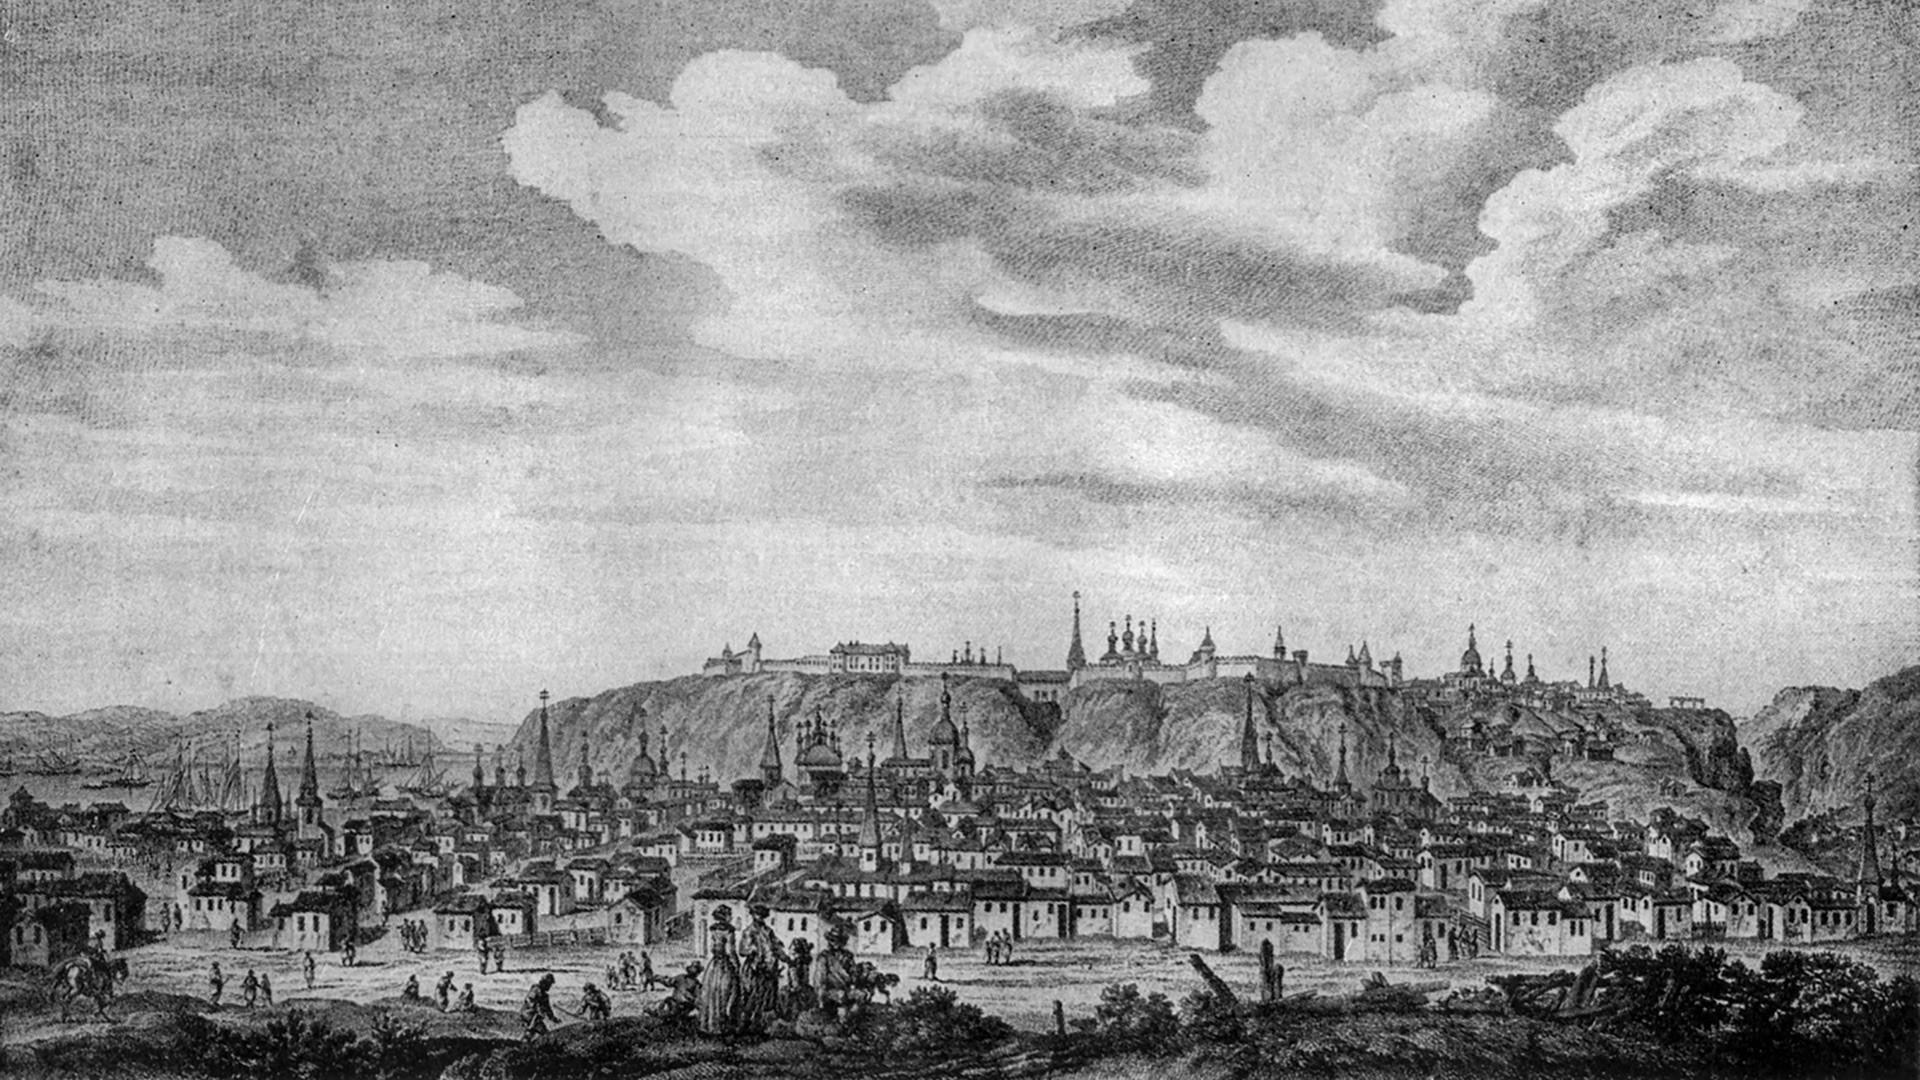 City of Tobolsk. Alfred Nicolas Rambaud, 1898